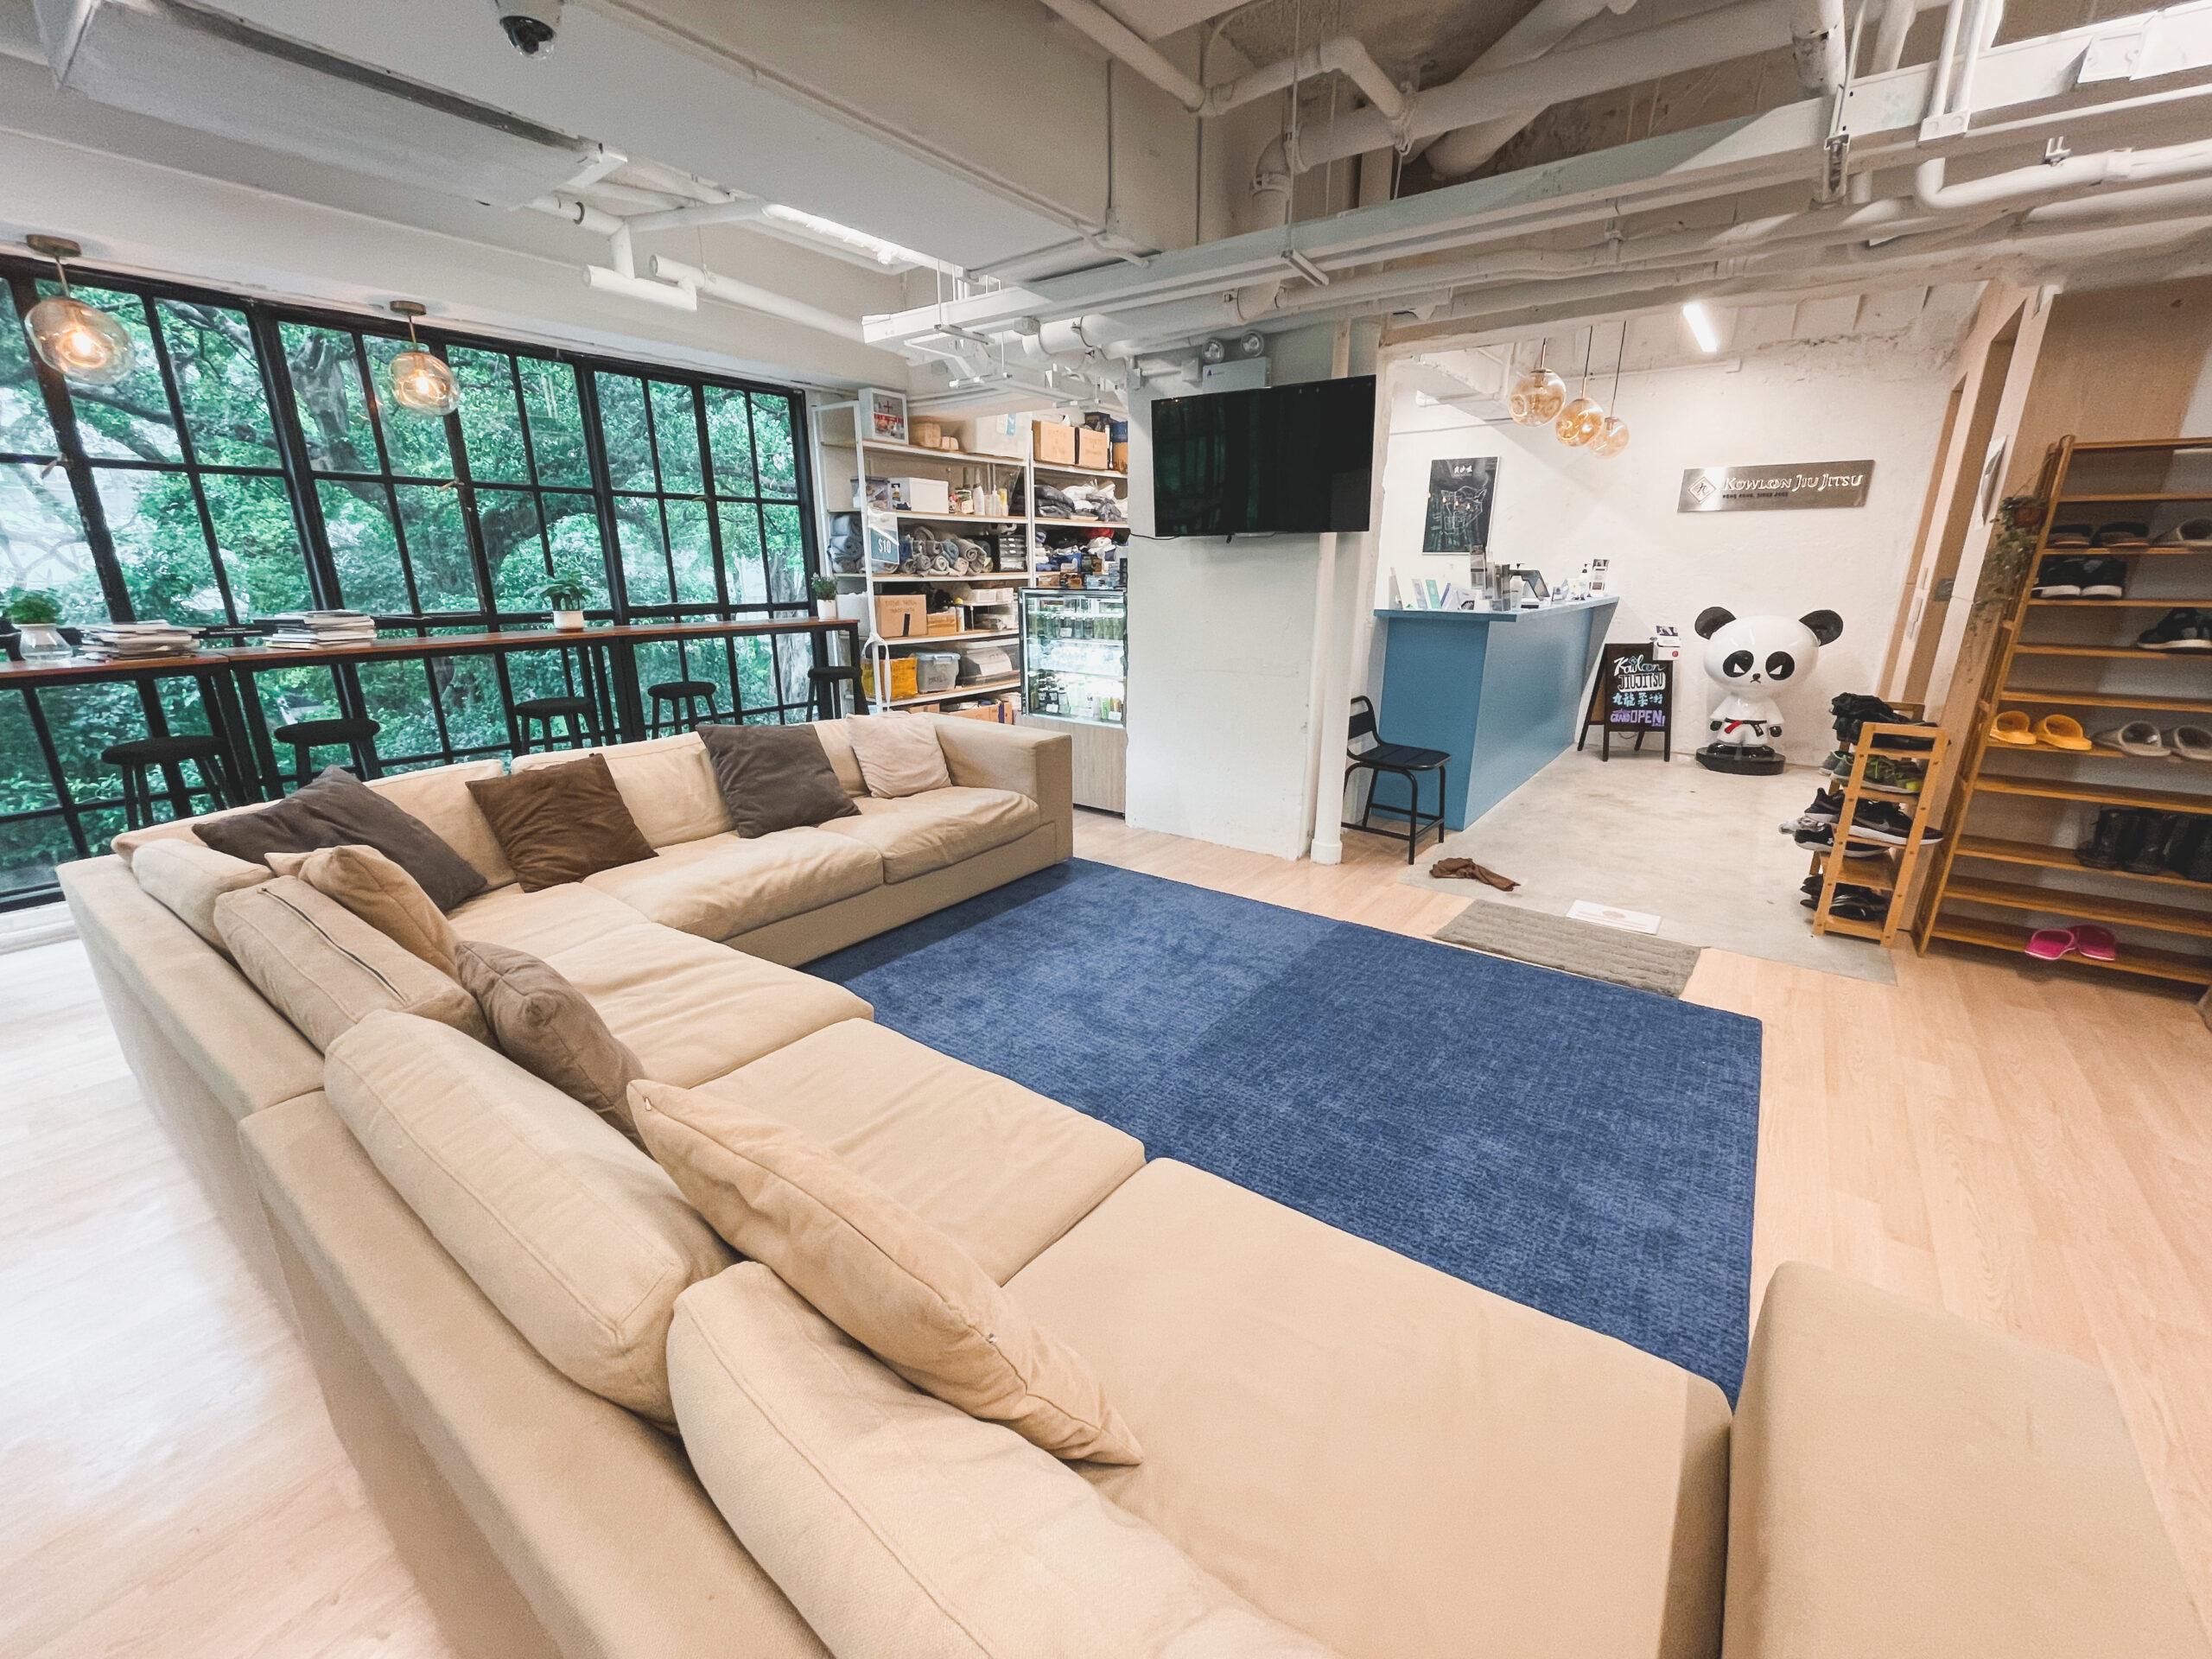 Kowloon Jiu Jitsu Hong Kong - Lounge Area